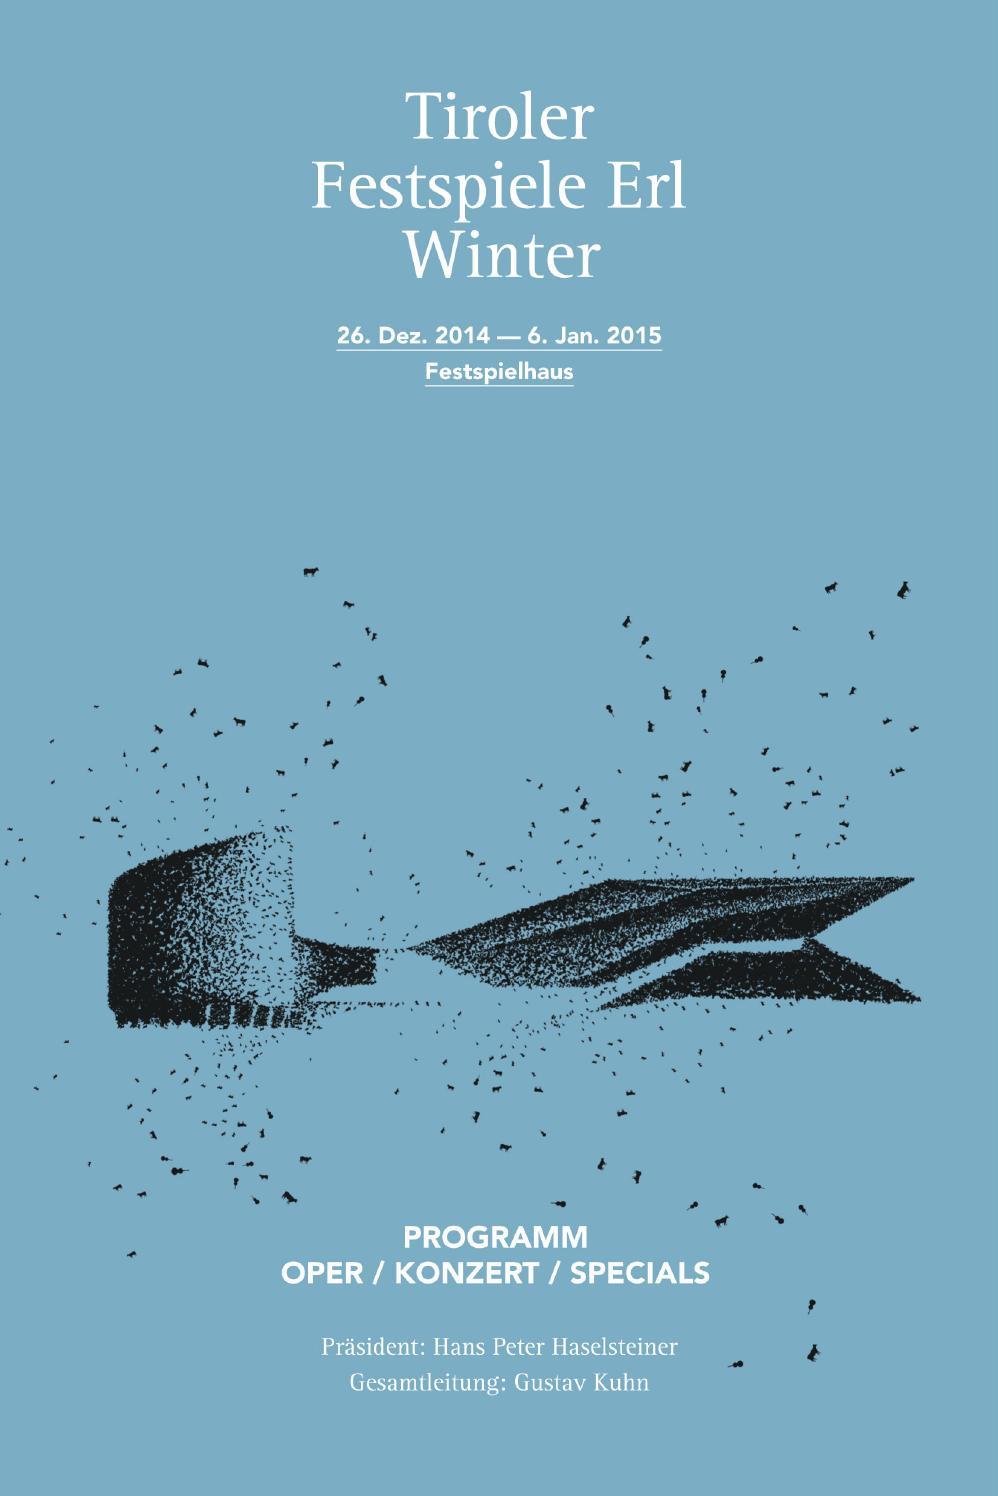 Perfekt Abendprogramm TFE Winter 14/15 By Tiroler Festspiele Erl Betriebsges.m.b.H.    Issuu